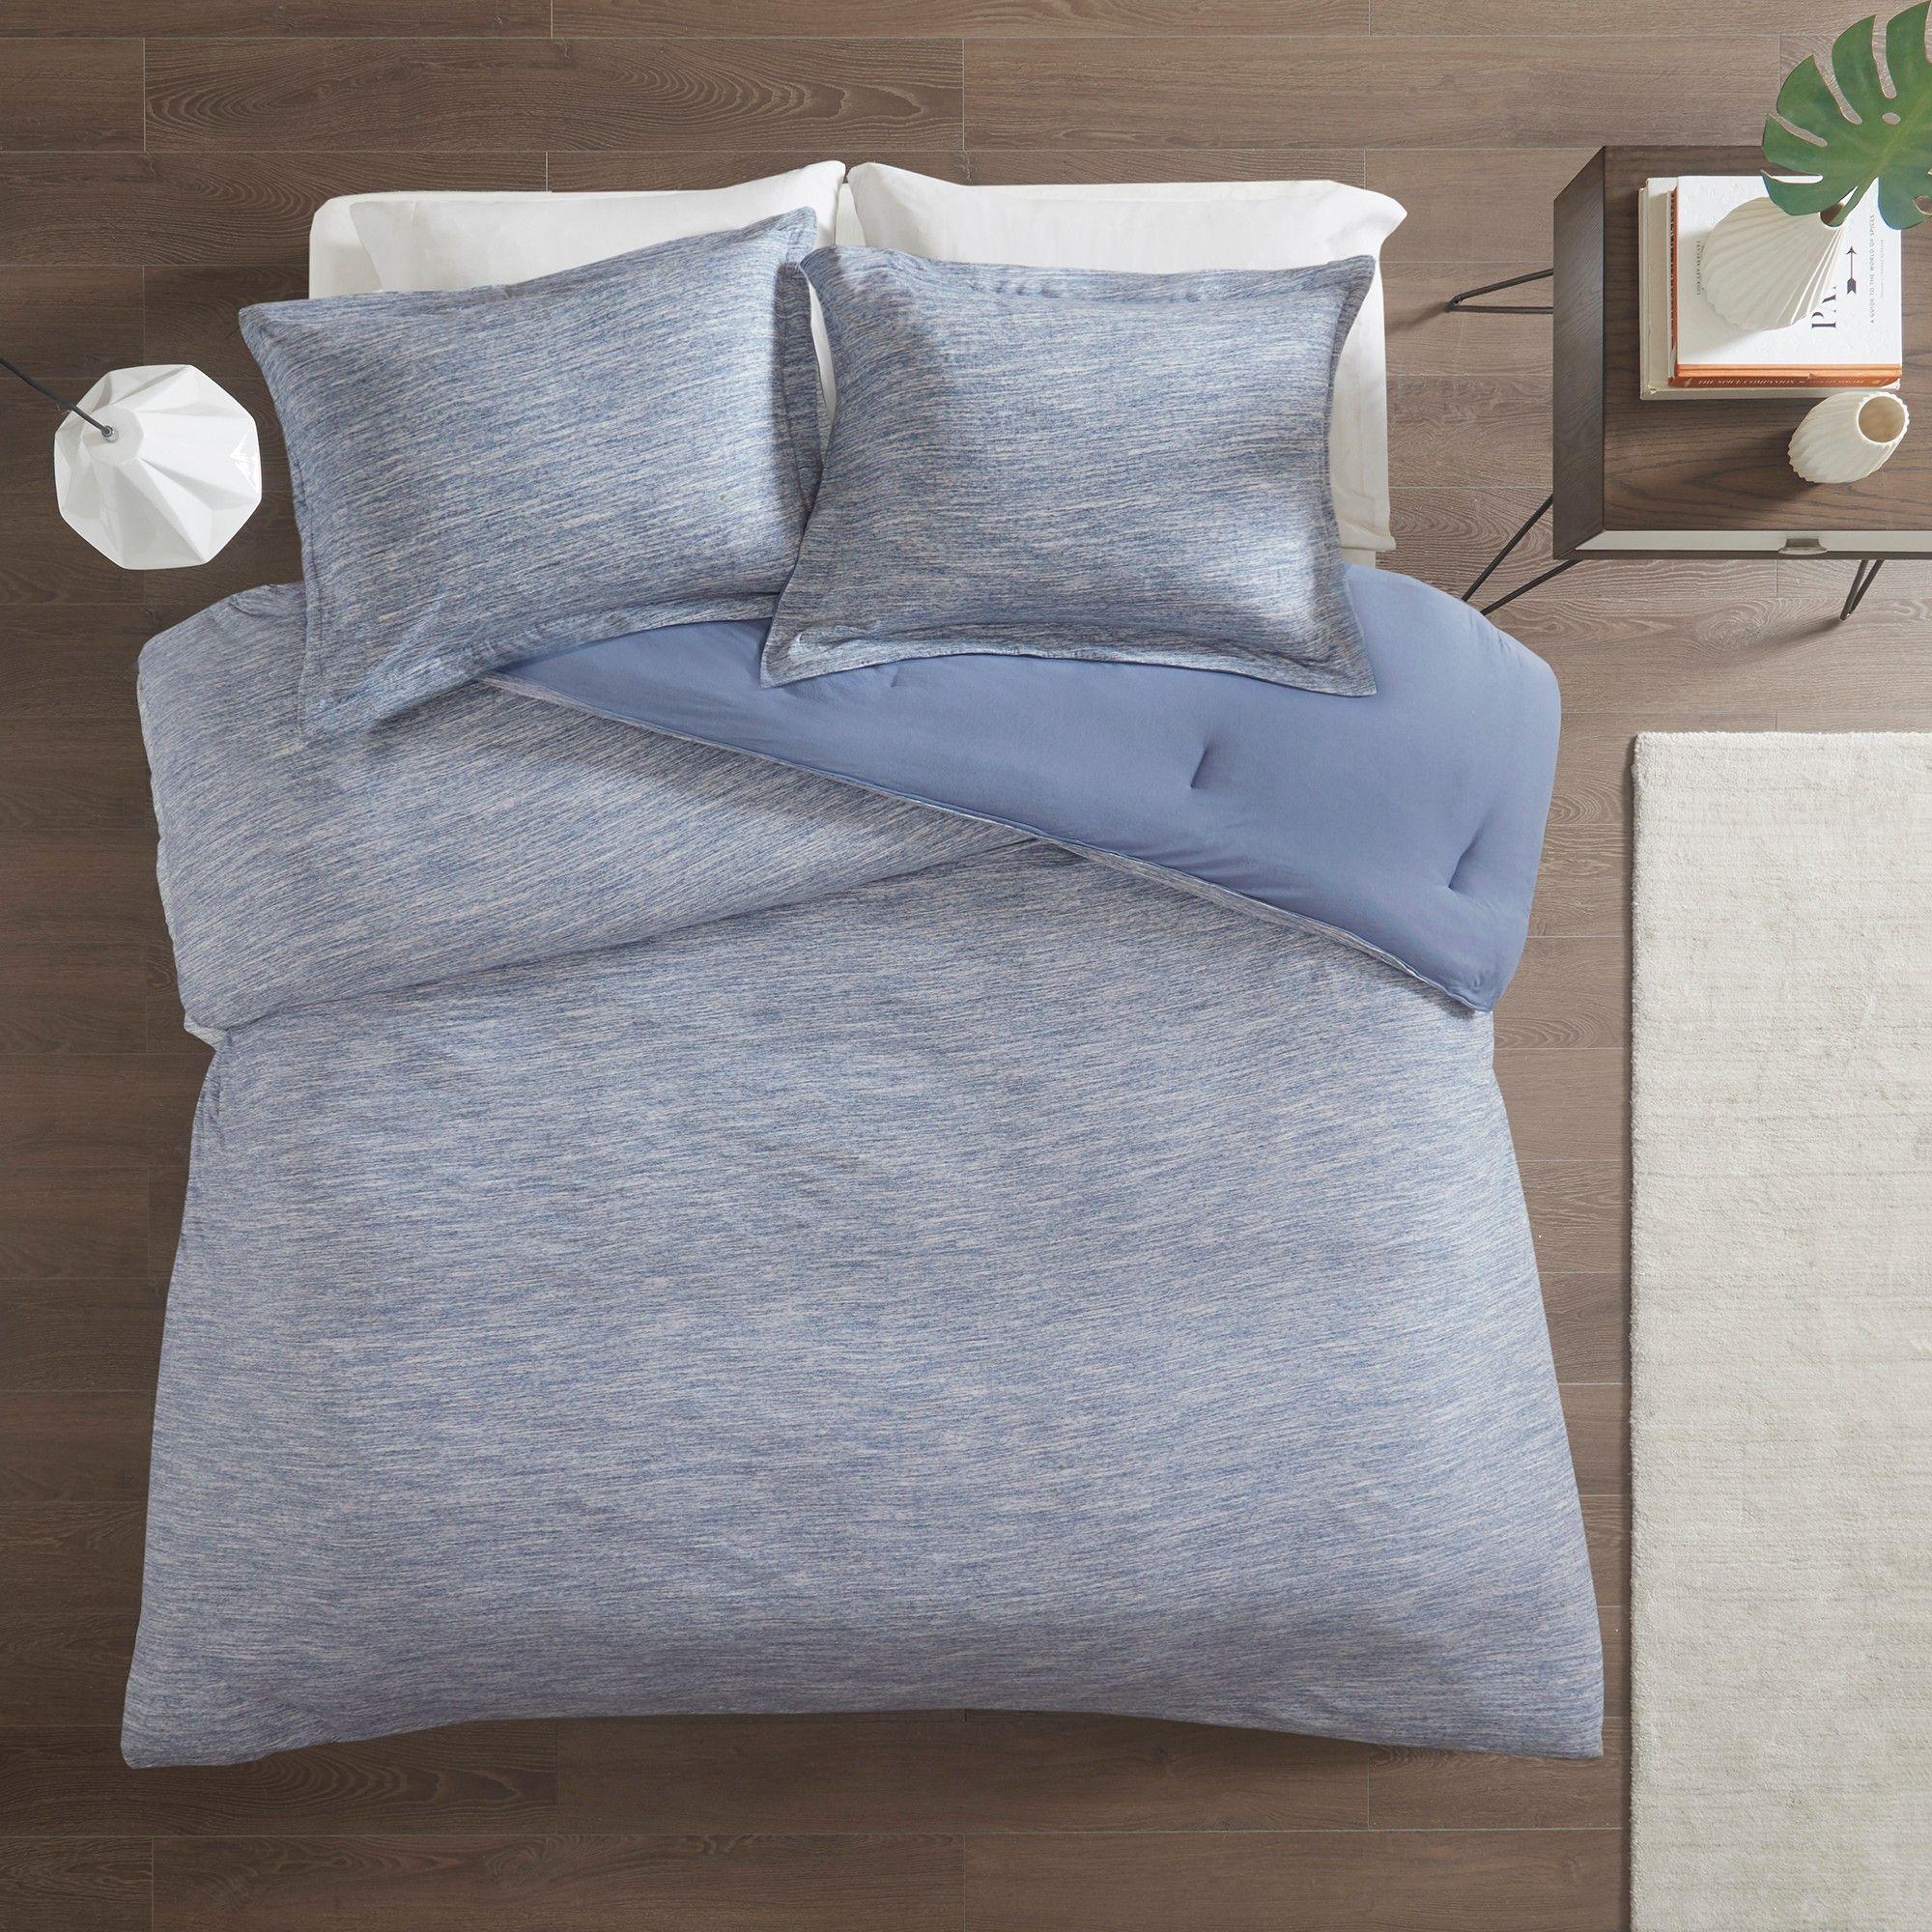 Full Queen 3pc Spacedye Cotton Jersey Comforter Set Blue